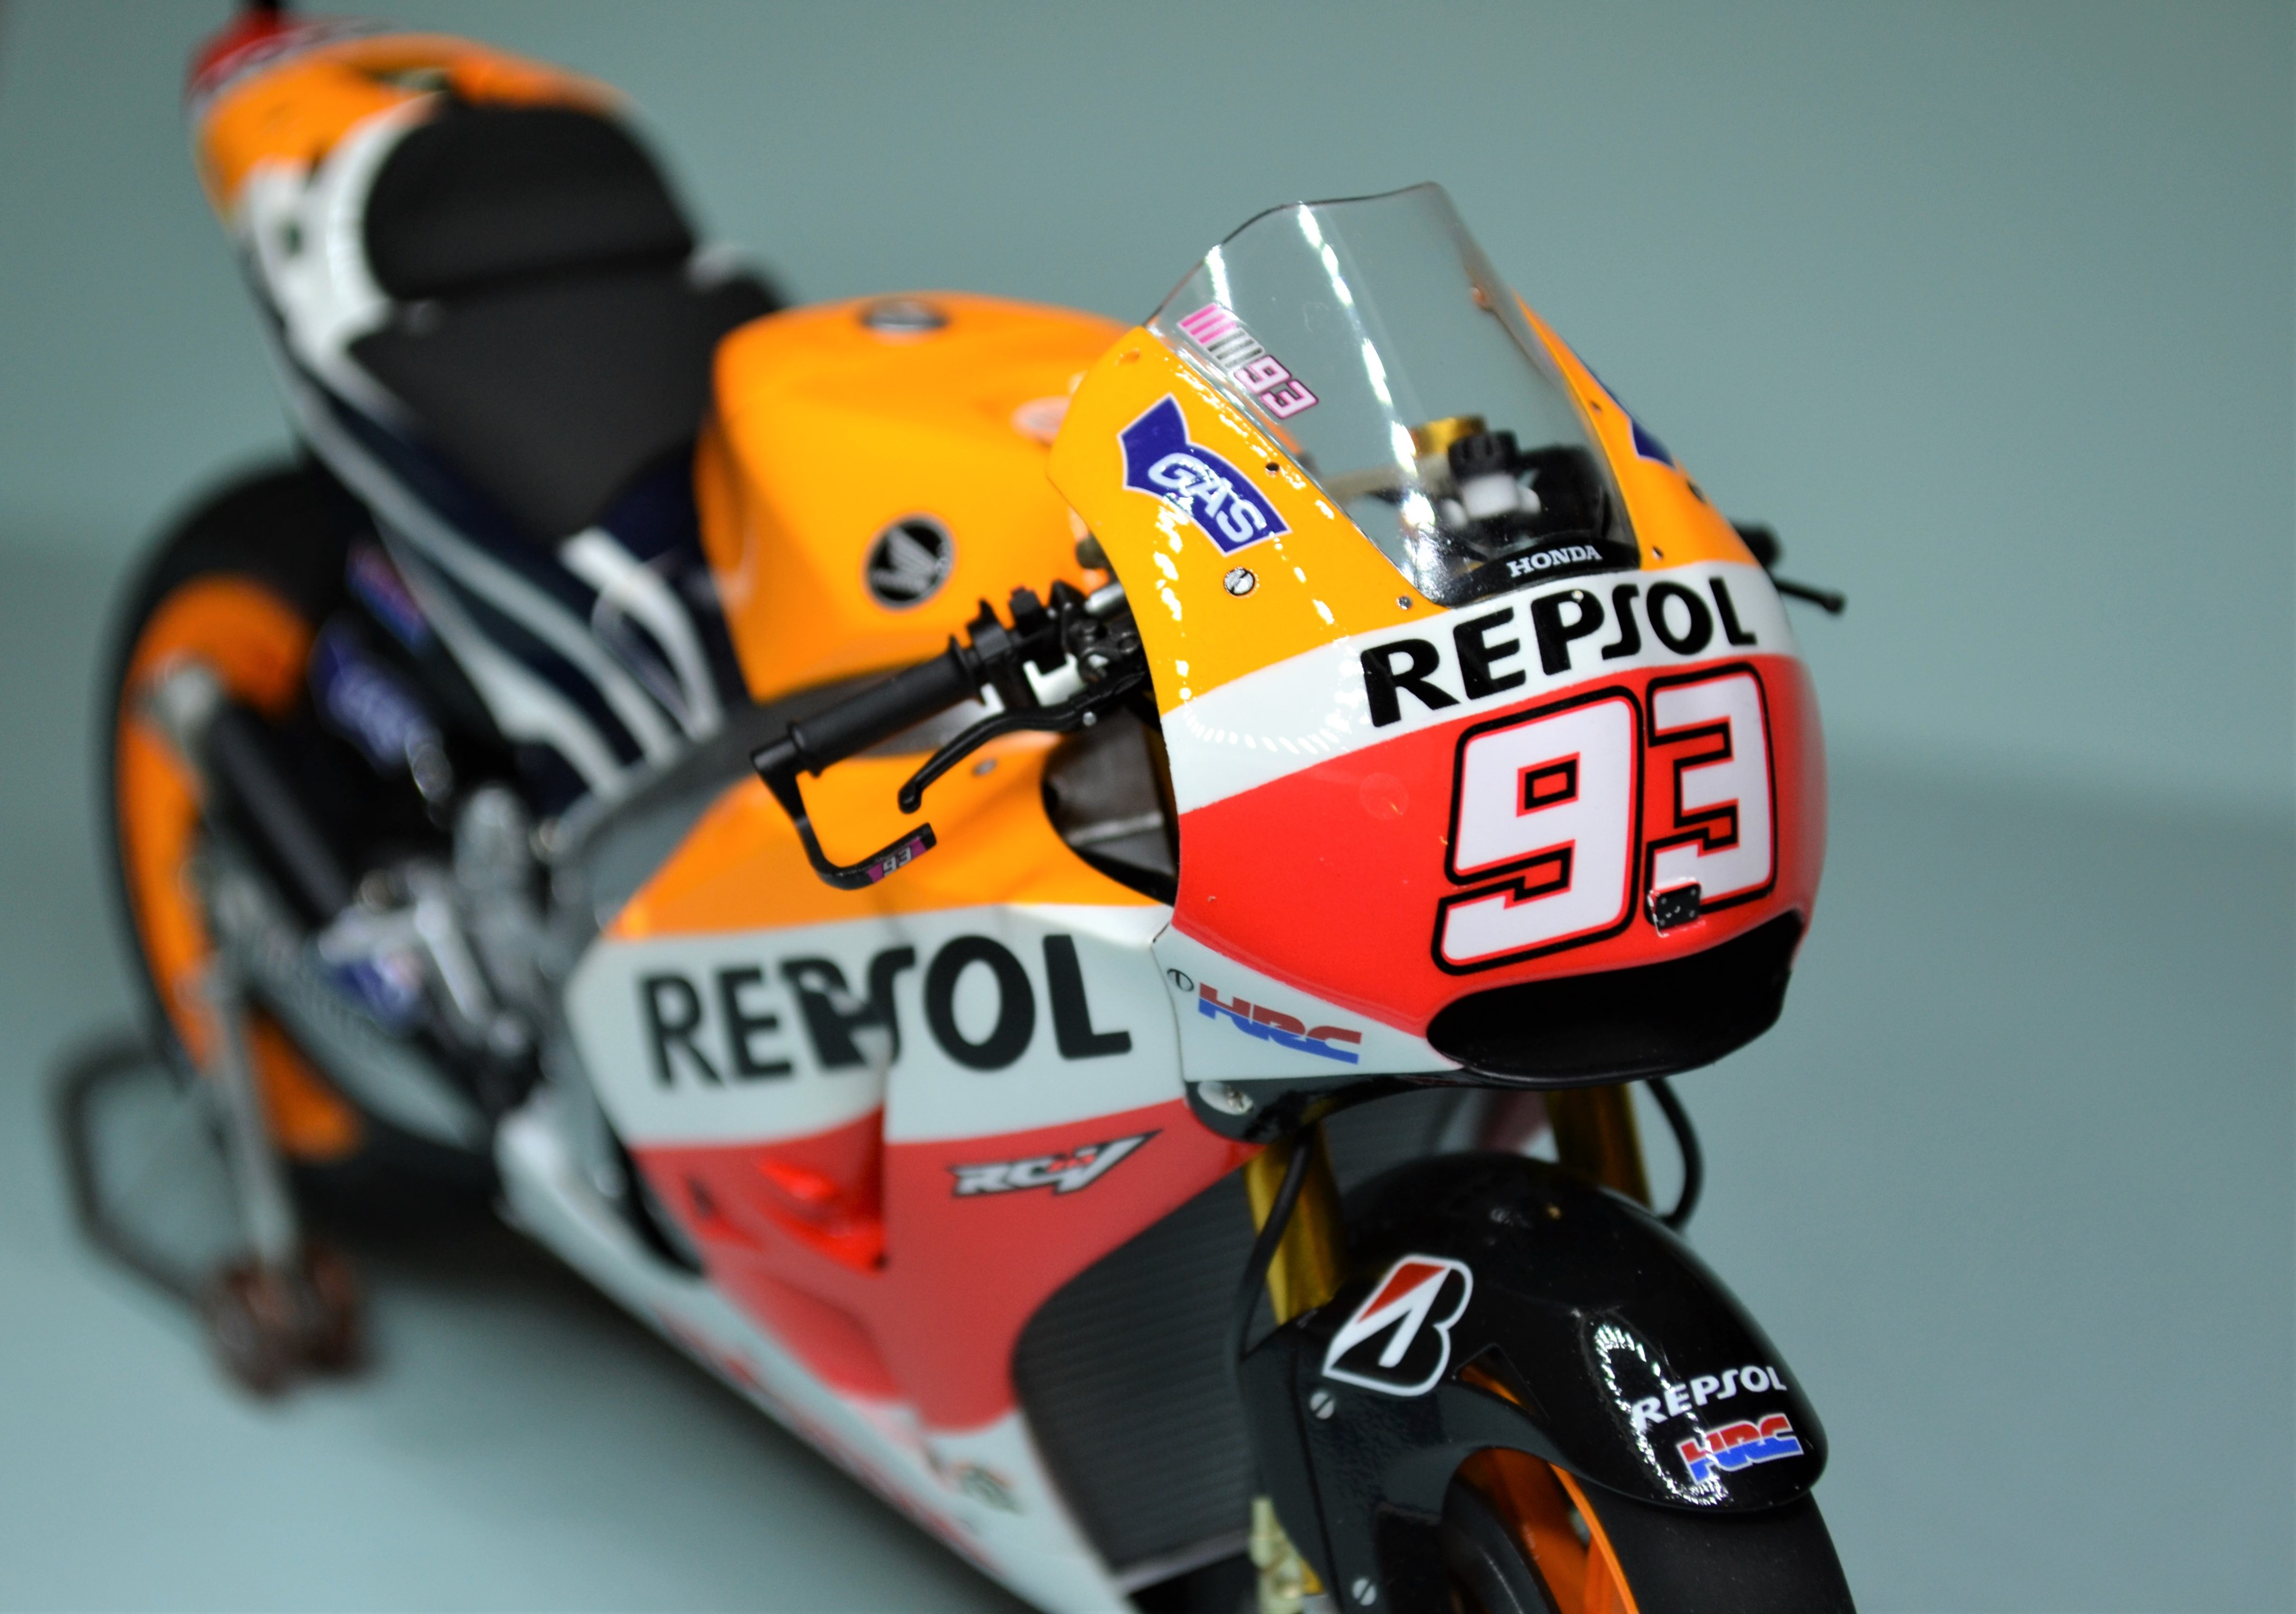 Honda Repsol Marc Marquez 1/12  - Page 2 17073112314817938